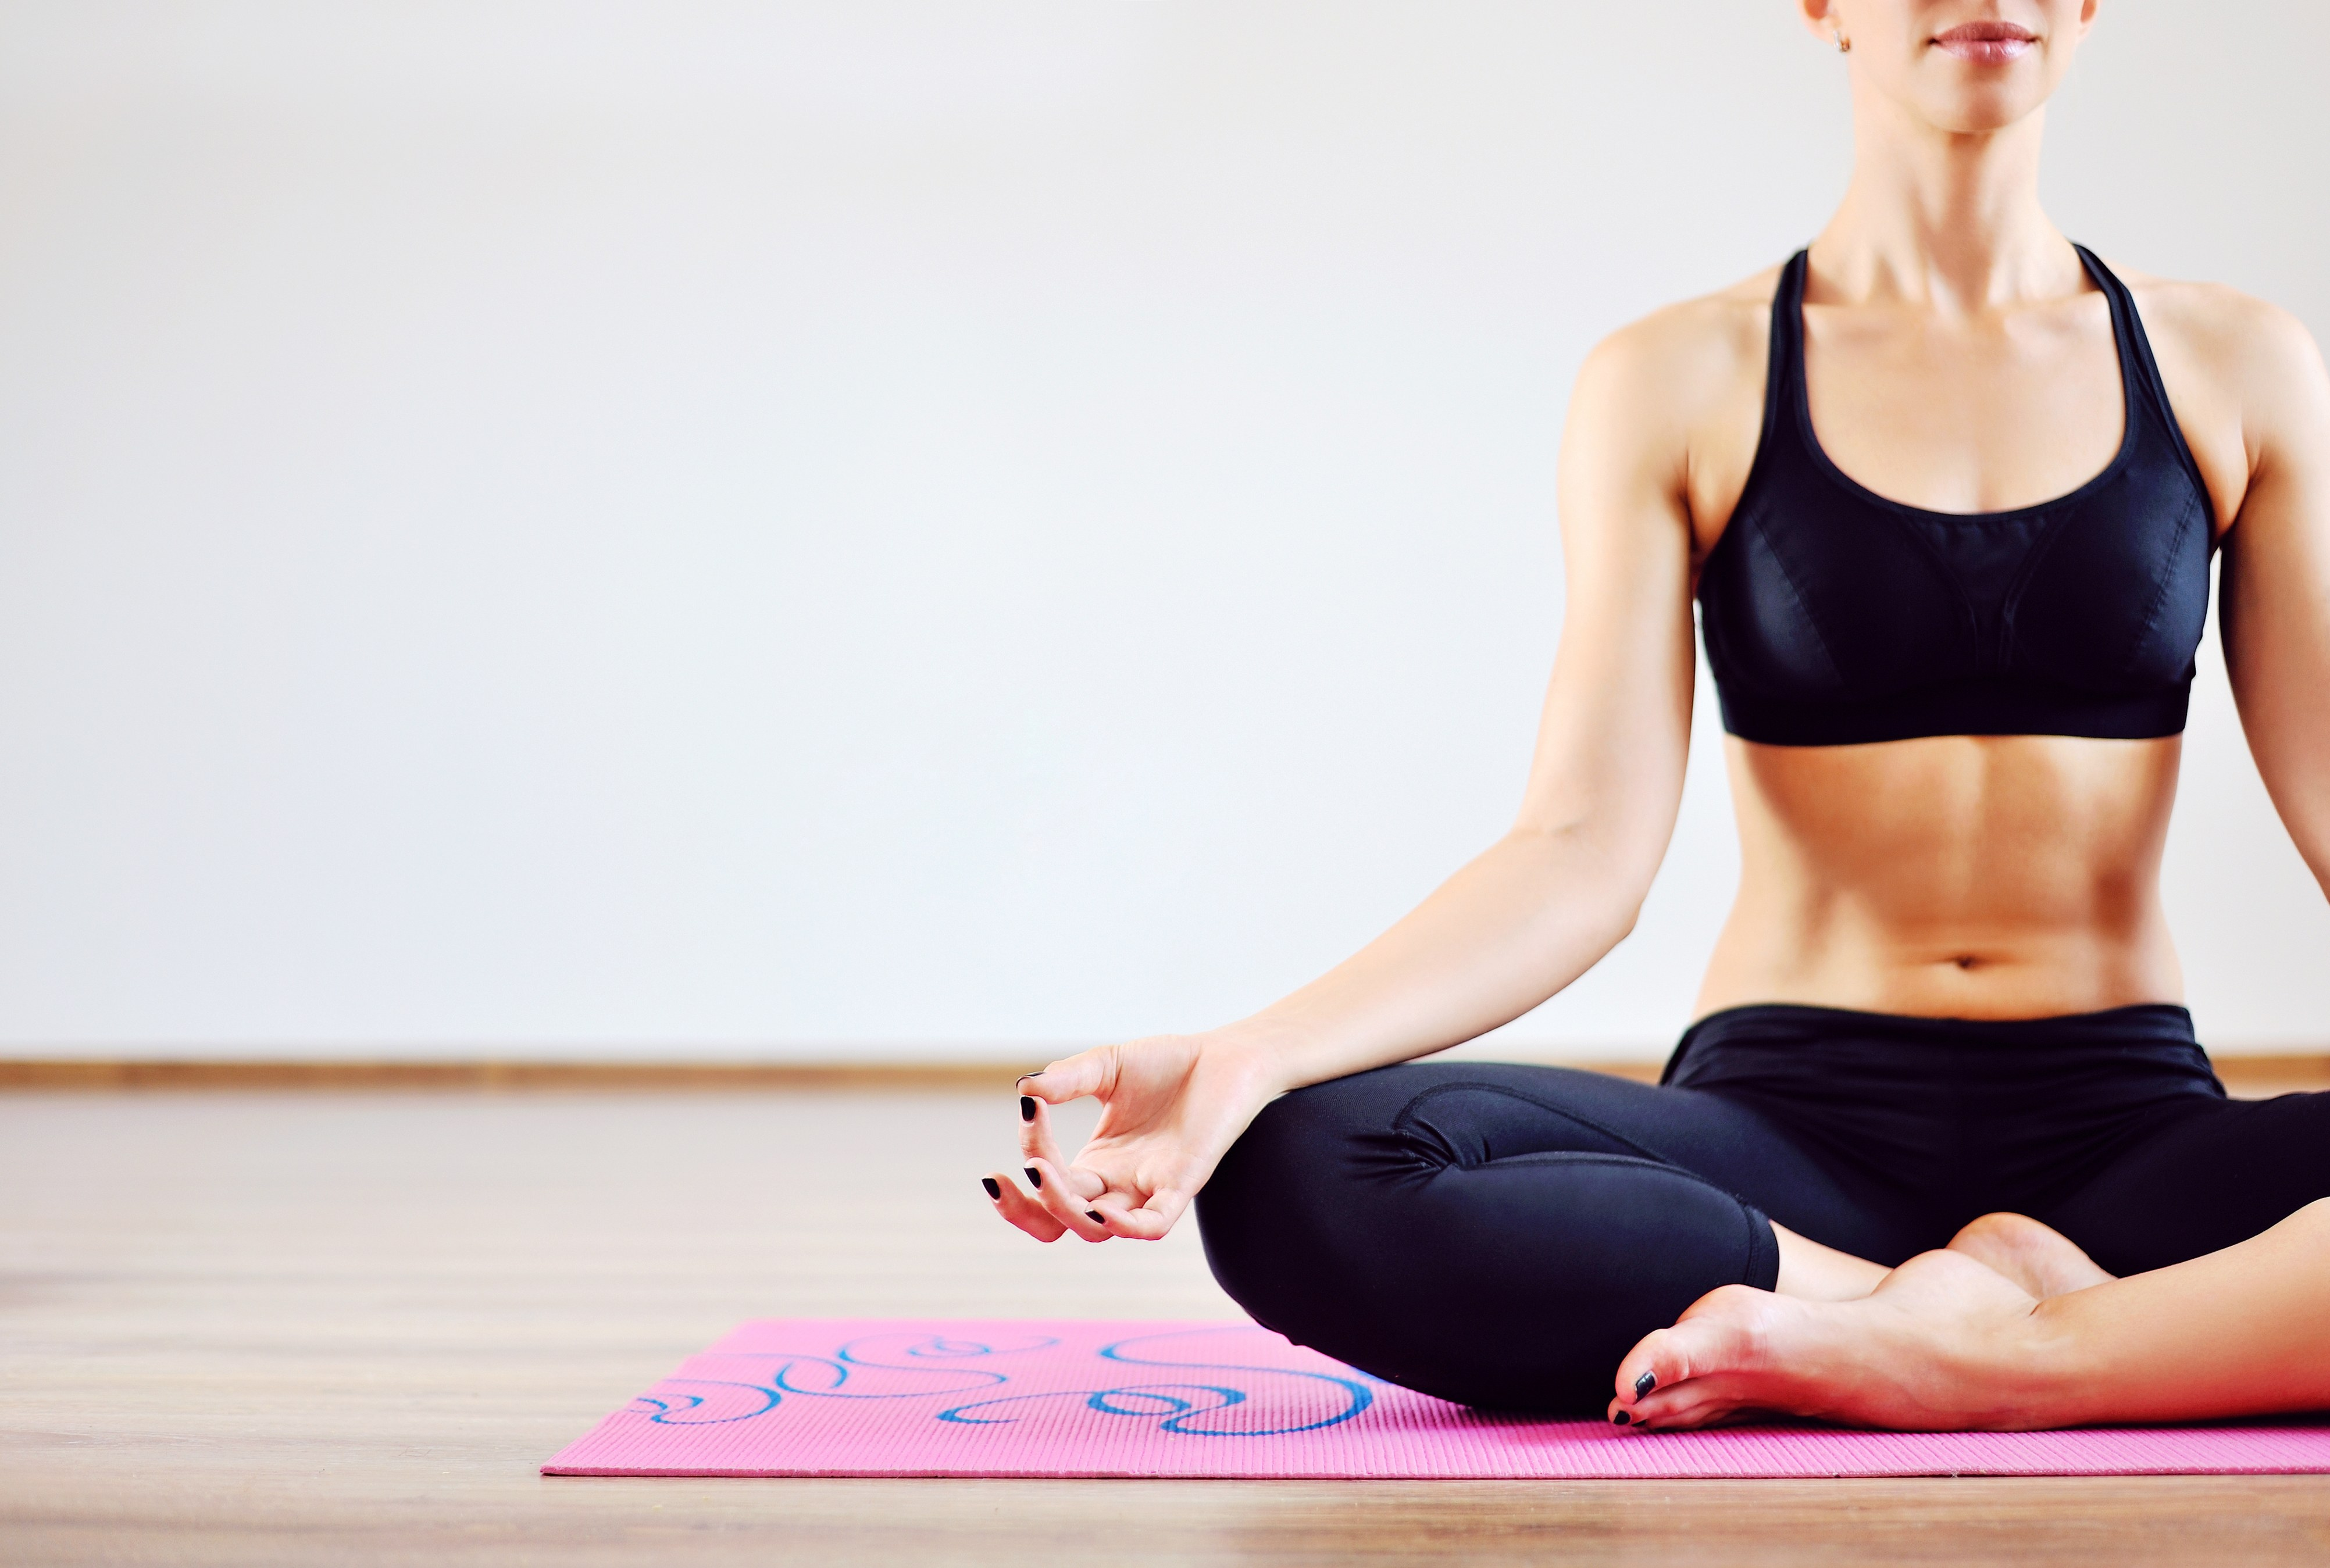 stressrelieftips stressreliefmeditation stressrelief relaxation stress meditation yoga aromatherapy wellbeing relax hypnosis peace timemanagement exercise mindfulness mindset zen fitness chakras dontthinkfar chill music